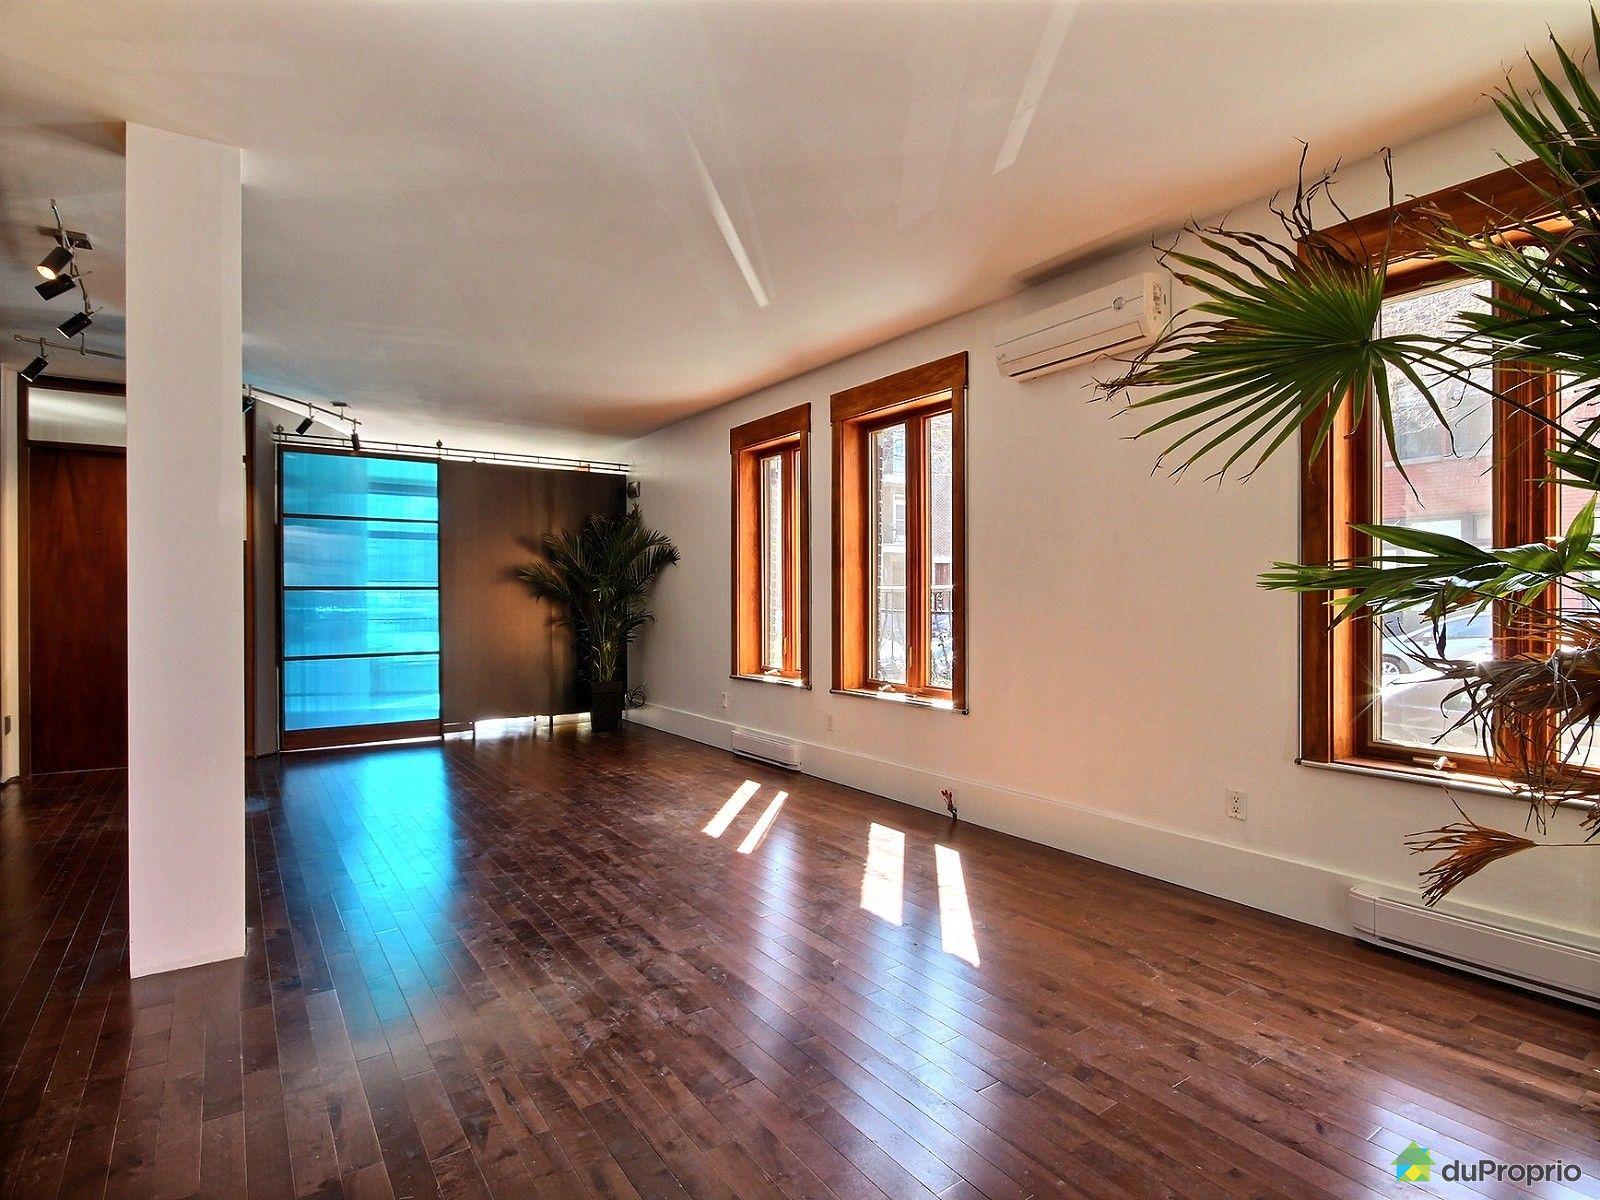 Condo vendre montr al 7287 rue berri immobilier qu bec for Salle a manger antique quebec